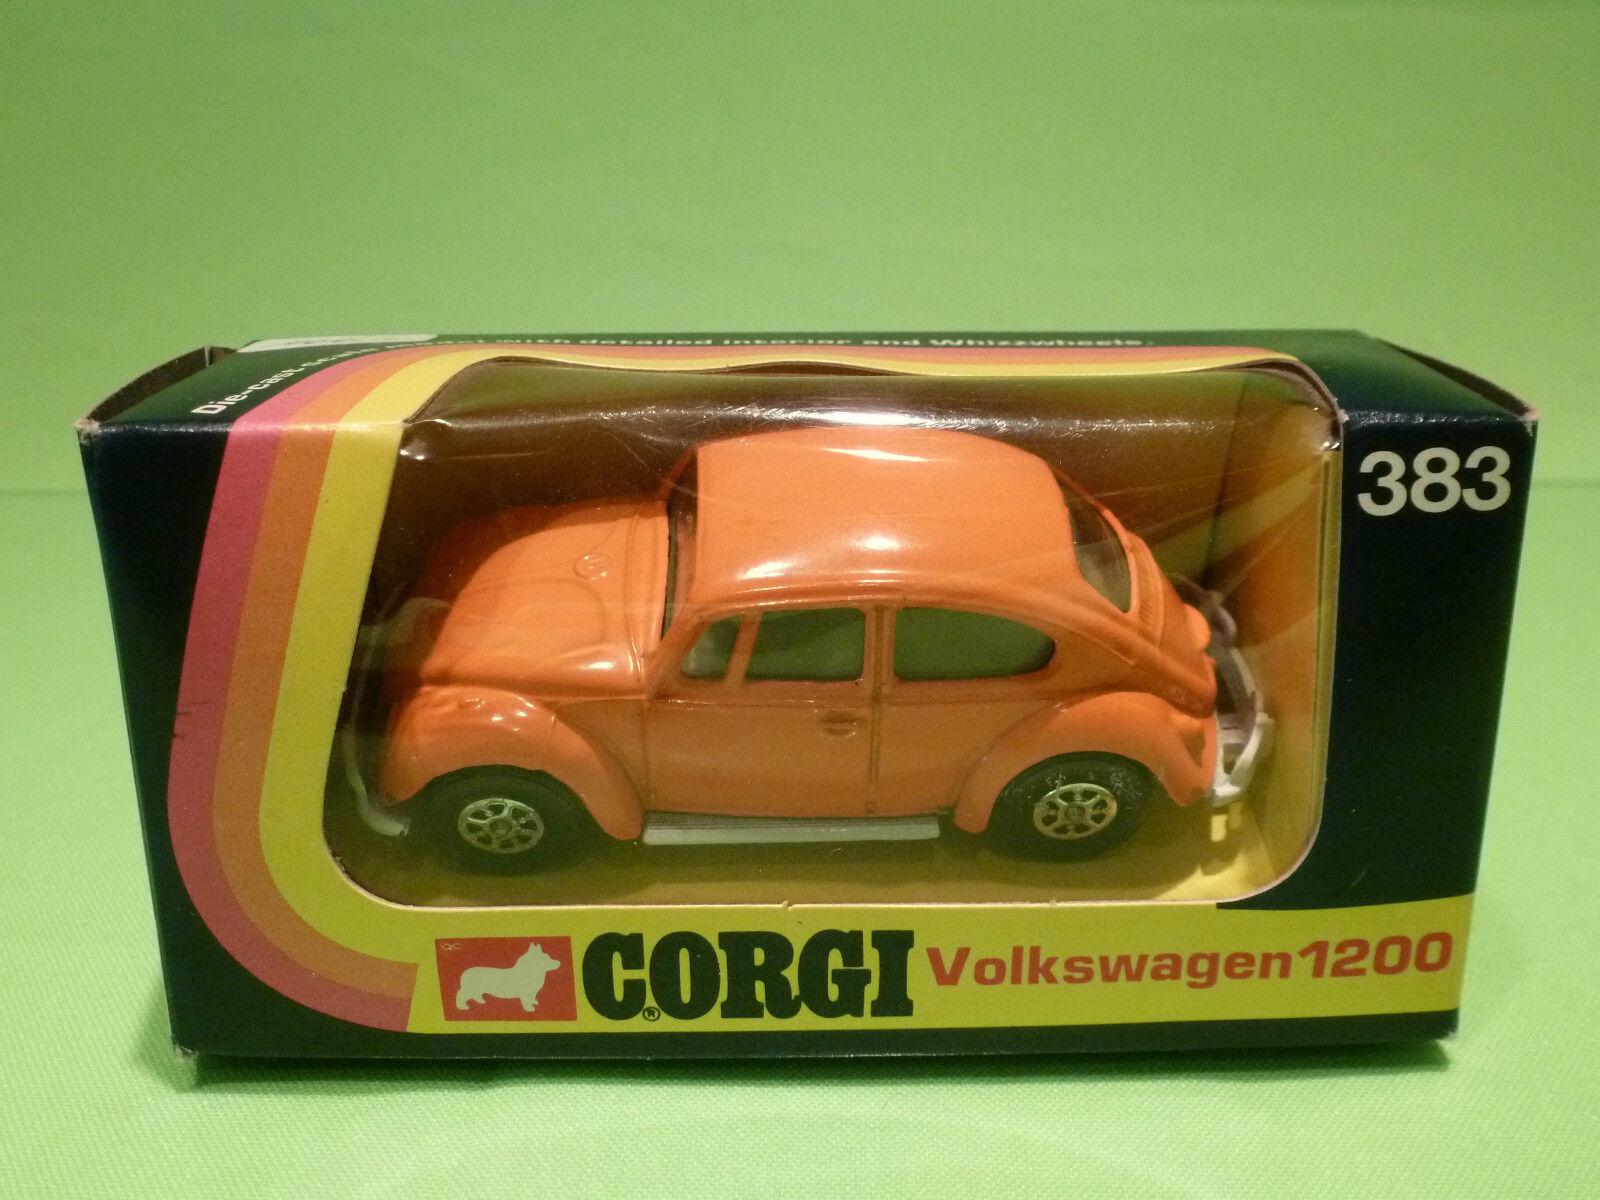 Esperando por ti CORGI TOYS 383 VW VOLKSWAGEN KAFER BEETLE - naranja naranja naranja 1 43 -  VERY GOOD IN BOX  comprar mejor